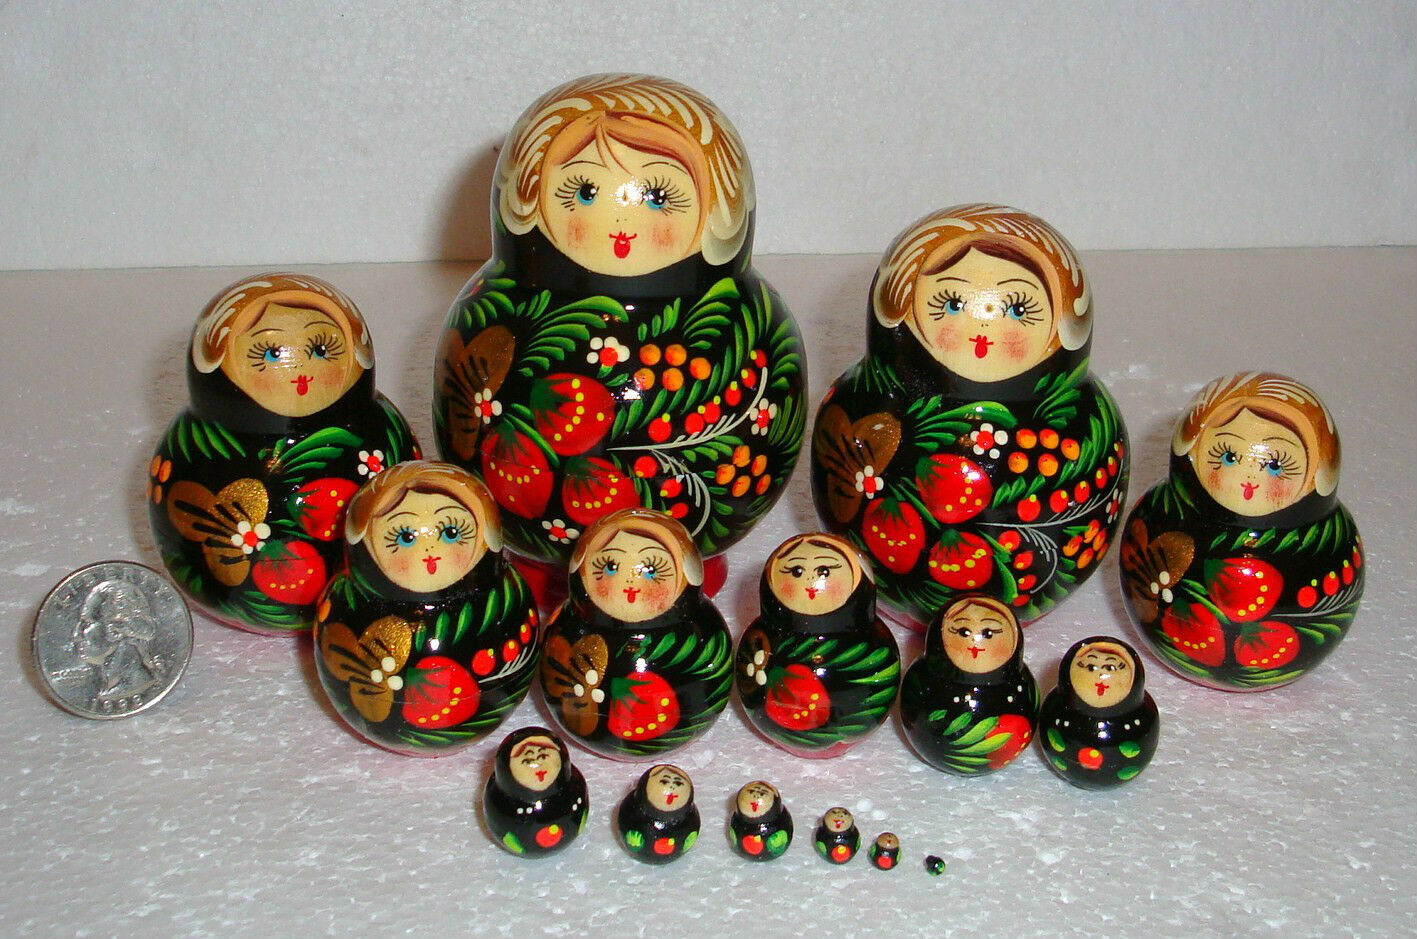 UNIQUE HANDPAINTED Nesting Doll 15pc3.5